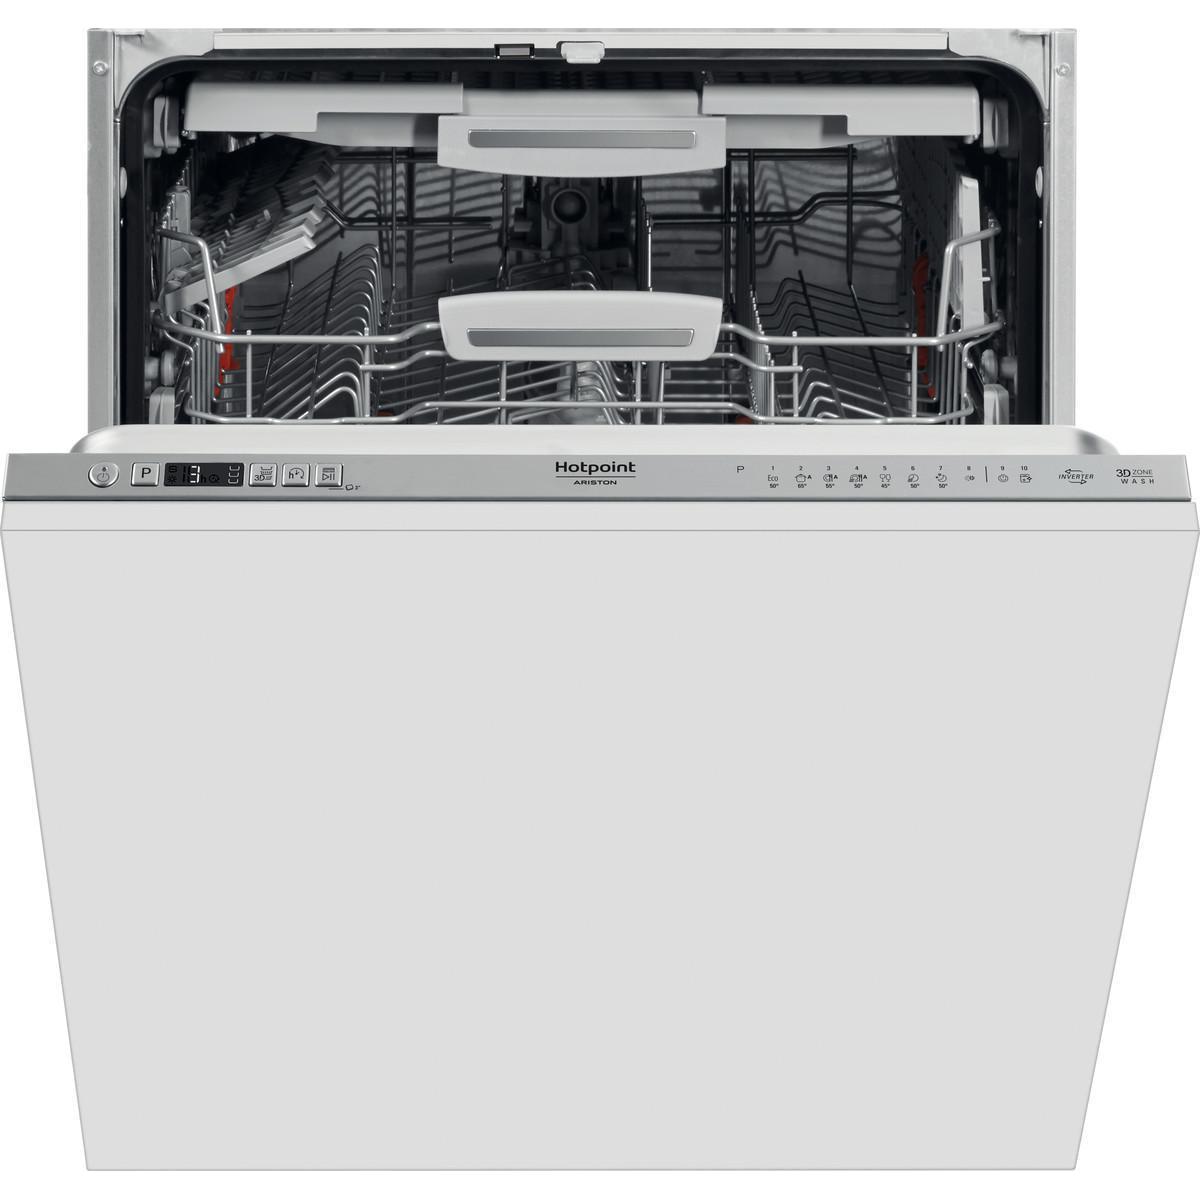 Fotografie Masina de spalat vase incorporabila Hotpoint HIC3O33WLEG, 14 seturi, 10 programe, Clasa D, Zone Wash 3D, Motor Inverter, Sistem ActivEco, Alb